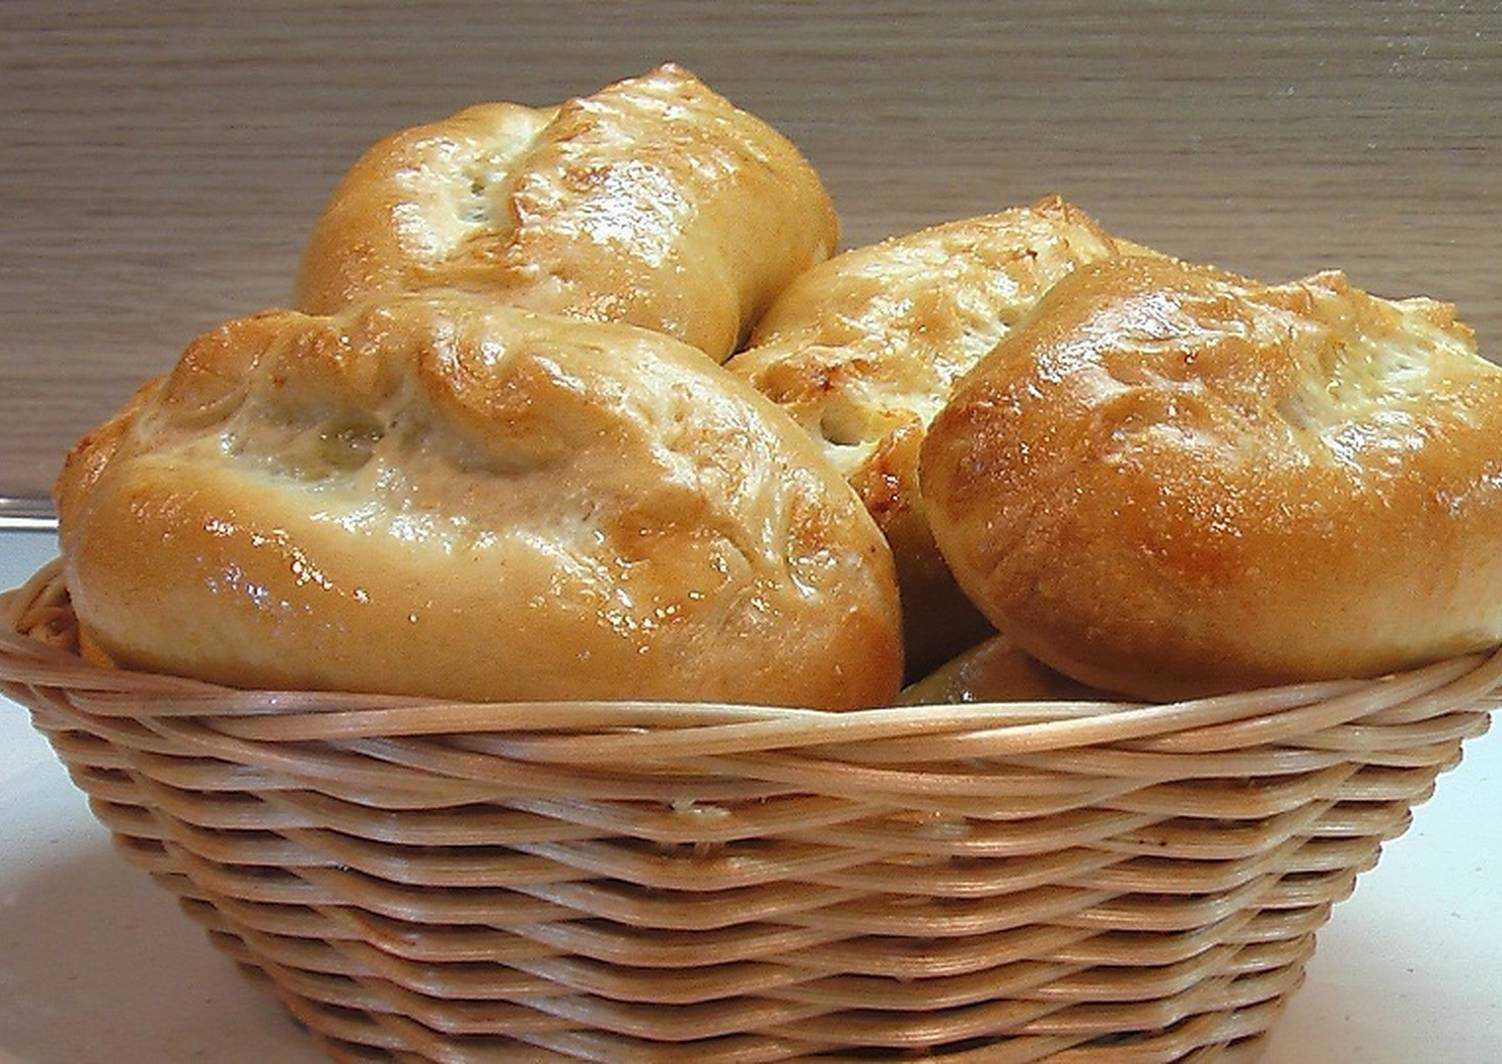 Пирожки с грибами от Herbalife Nutrition: рецепт, ингредиенты и фото